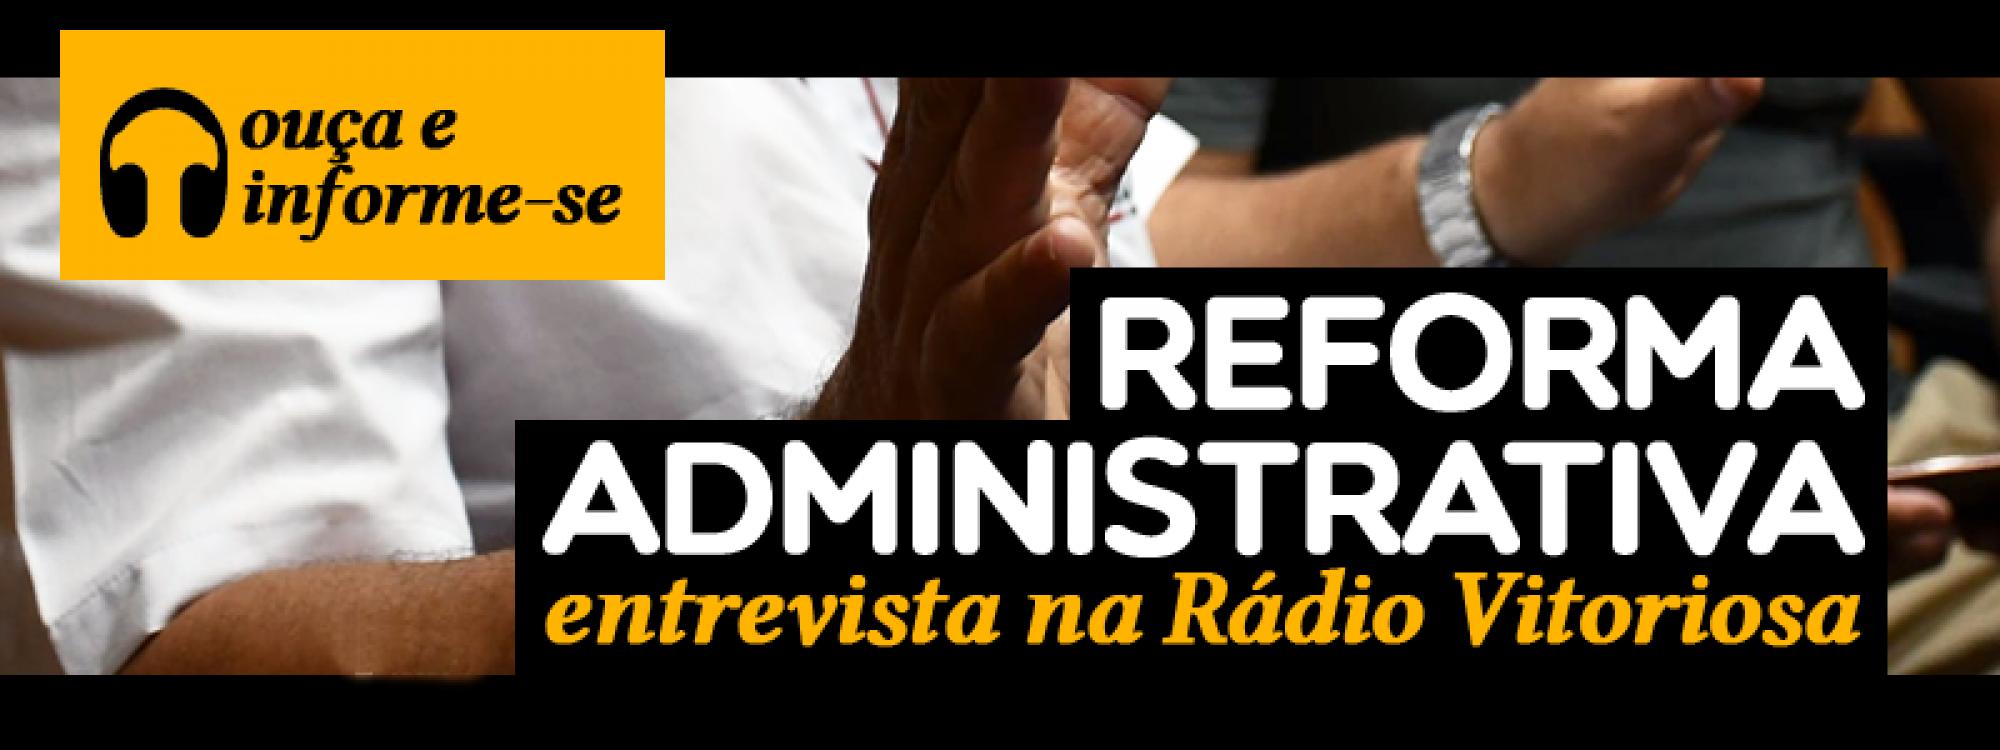 Presidente da ADUFU é entrevistado na Rádio Vitoriosa sobre a Reforma Administrativa